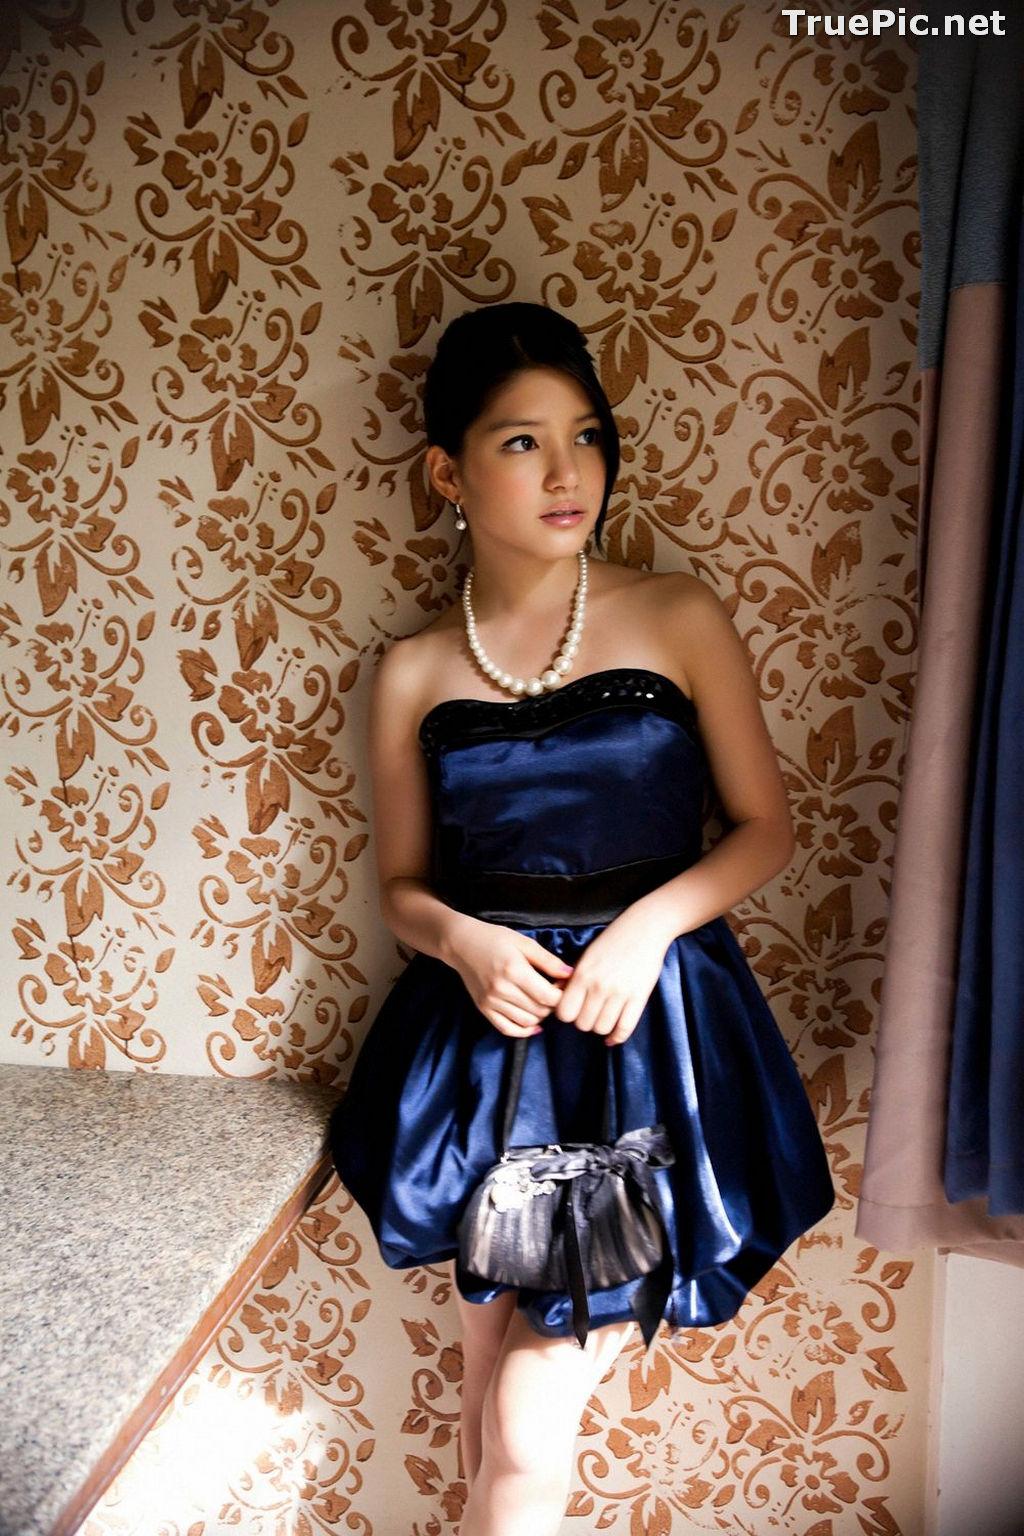 Image [YS Web] Vol.506 - Japanese Actress and Singer - Umika Kawashima - TruePic.net - Picture-16